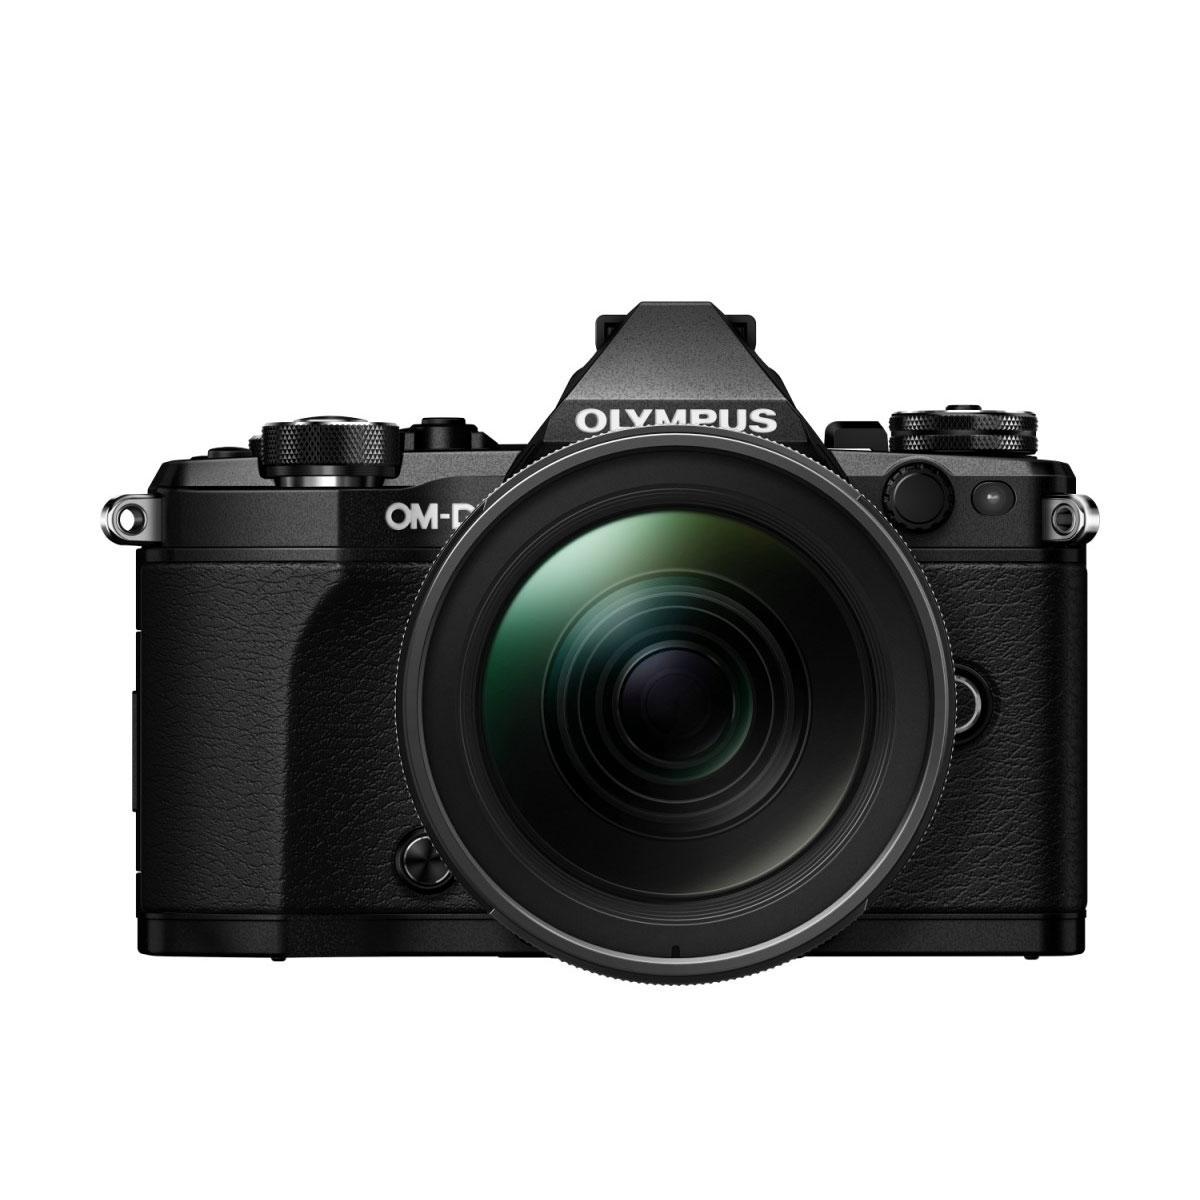 Olympus OM-D E-M5 MK II + M.Zuiko 12-40mm f/2.8 ED Pro – musta